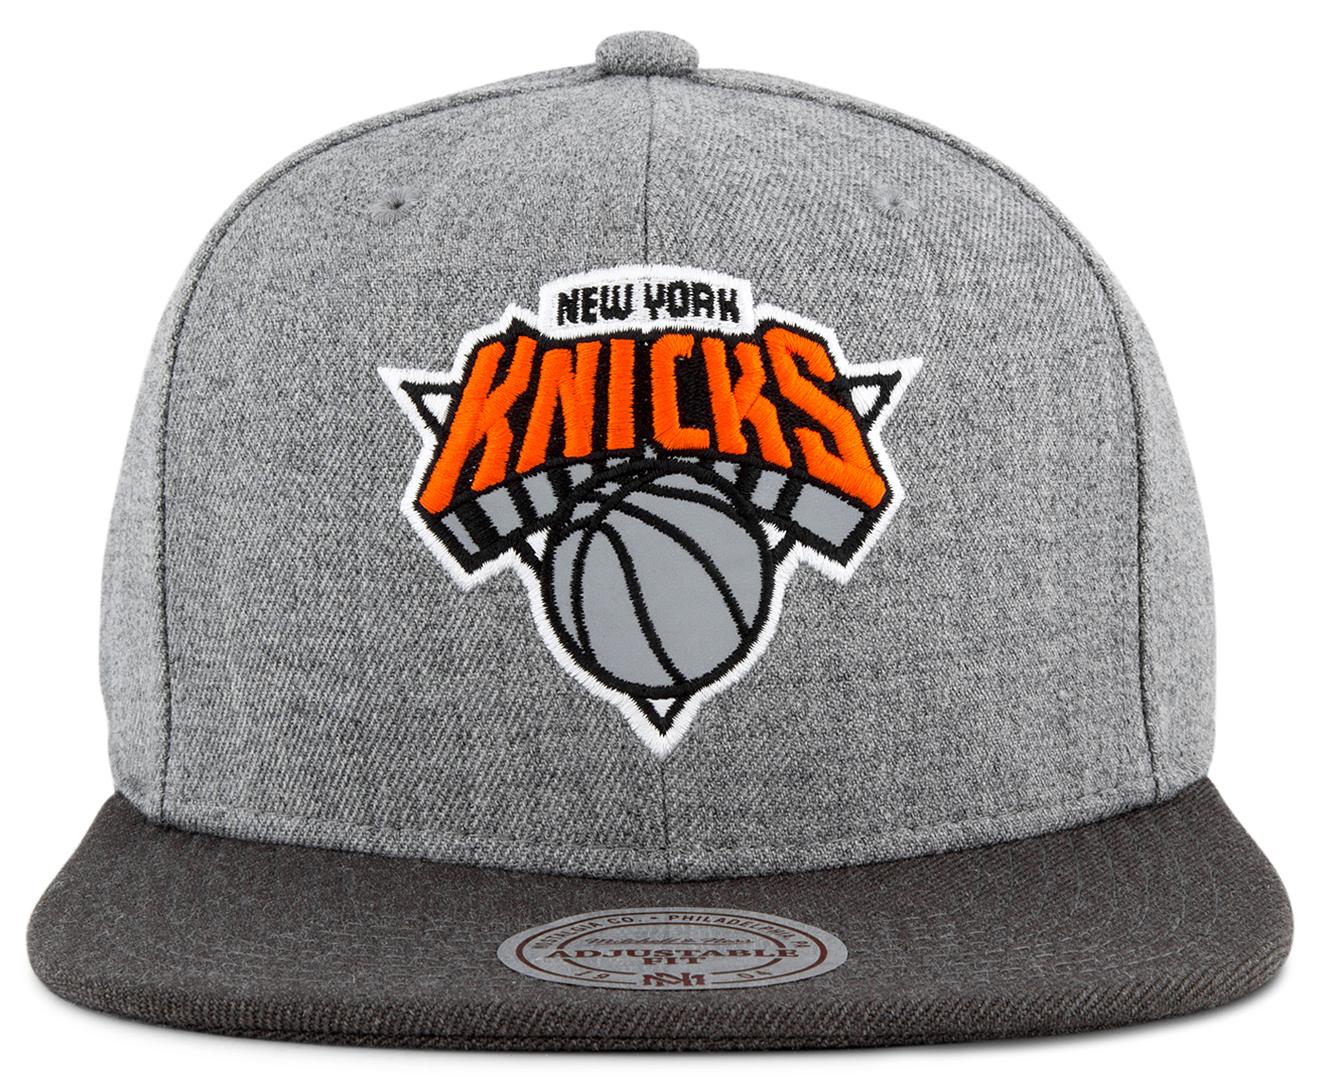 aa7a45ae3f8 Mitchell   Ness Heather Reflective Snapback Hat - New York Knicks   Grey